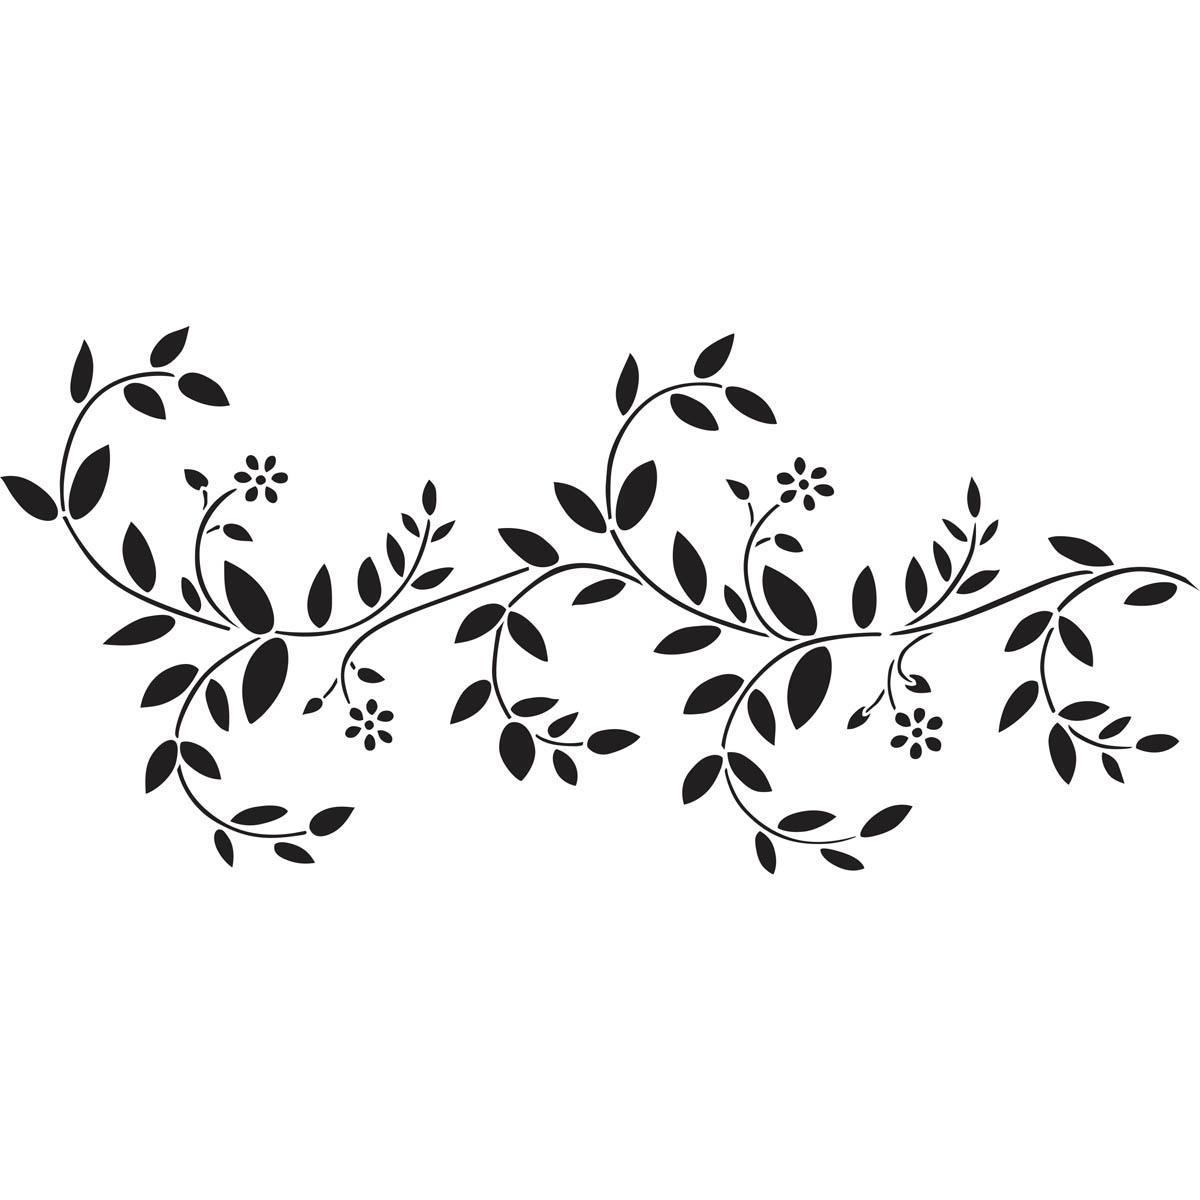 Black And White Vine Stencils